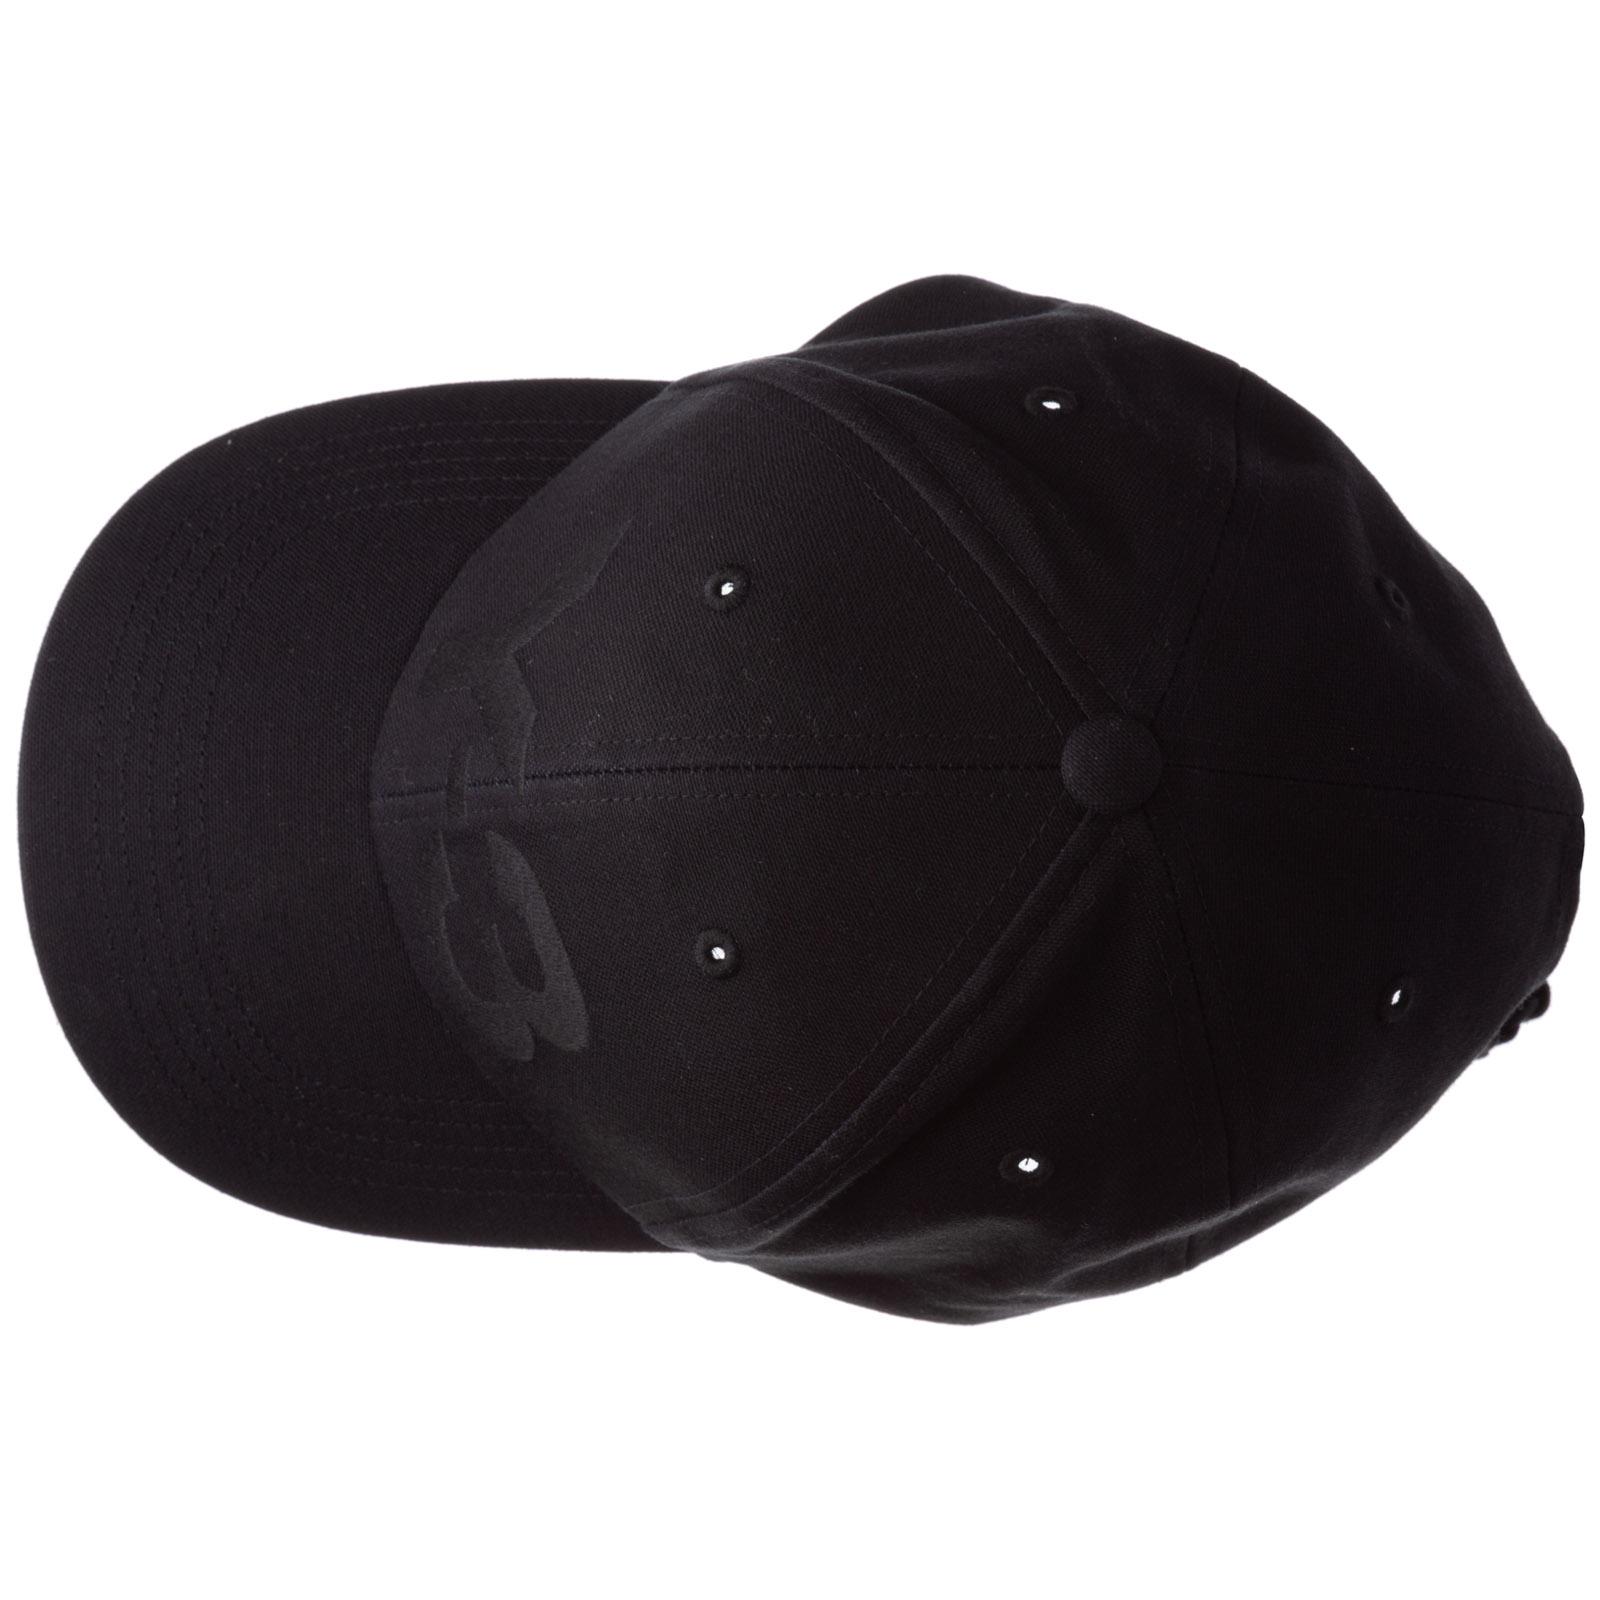 Adjustable men's cotton hat baseball cap  logo